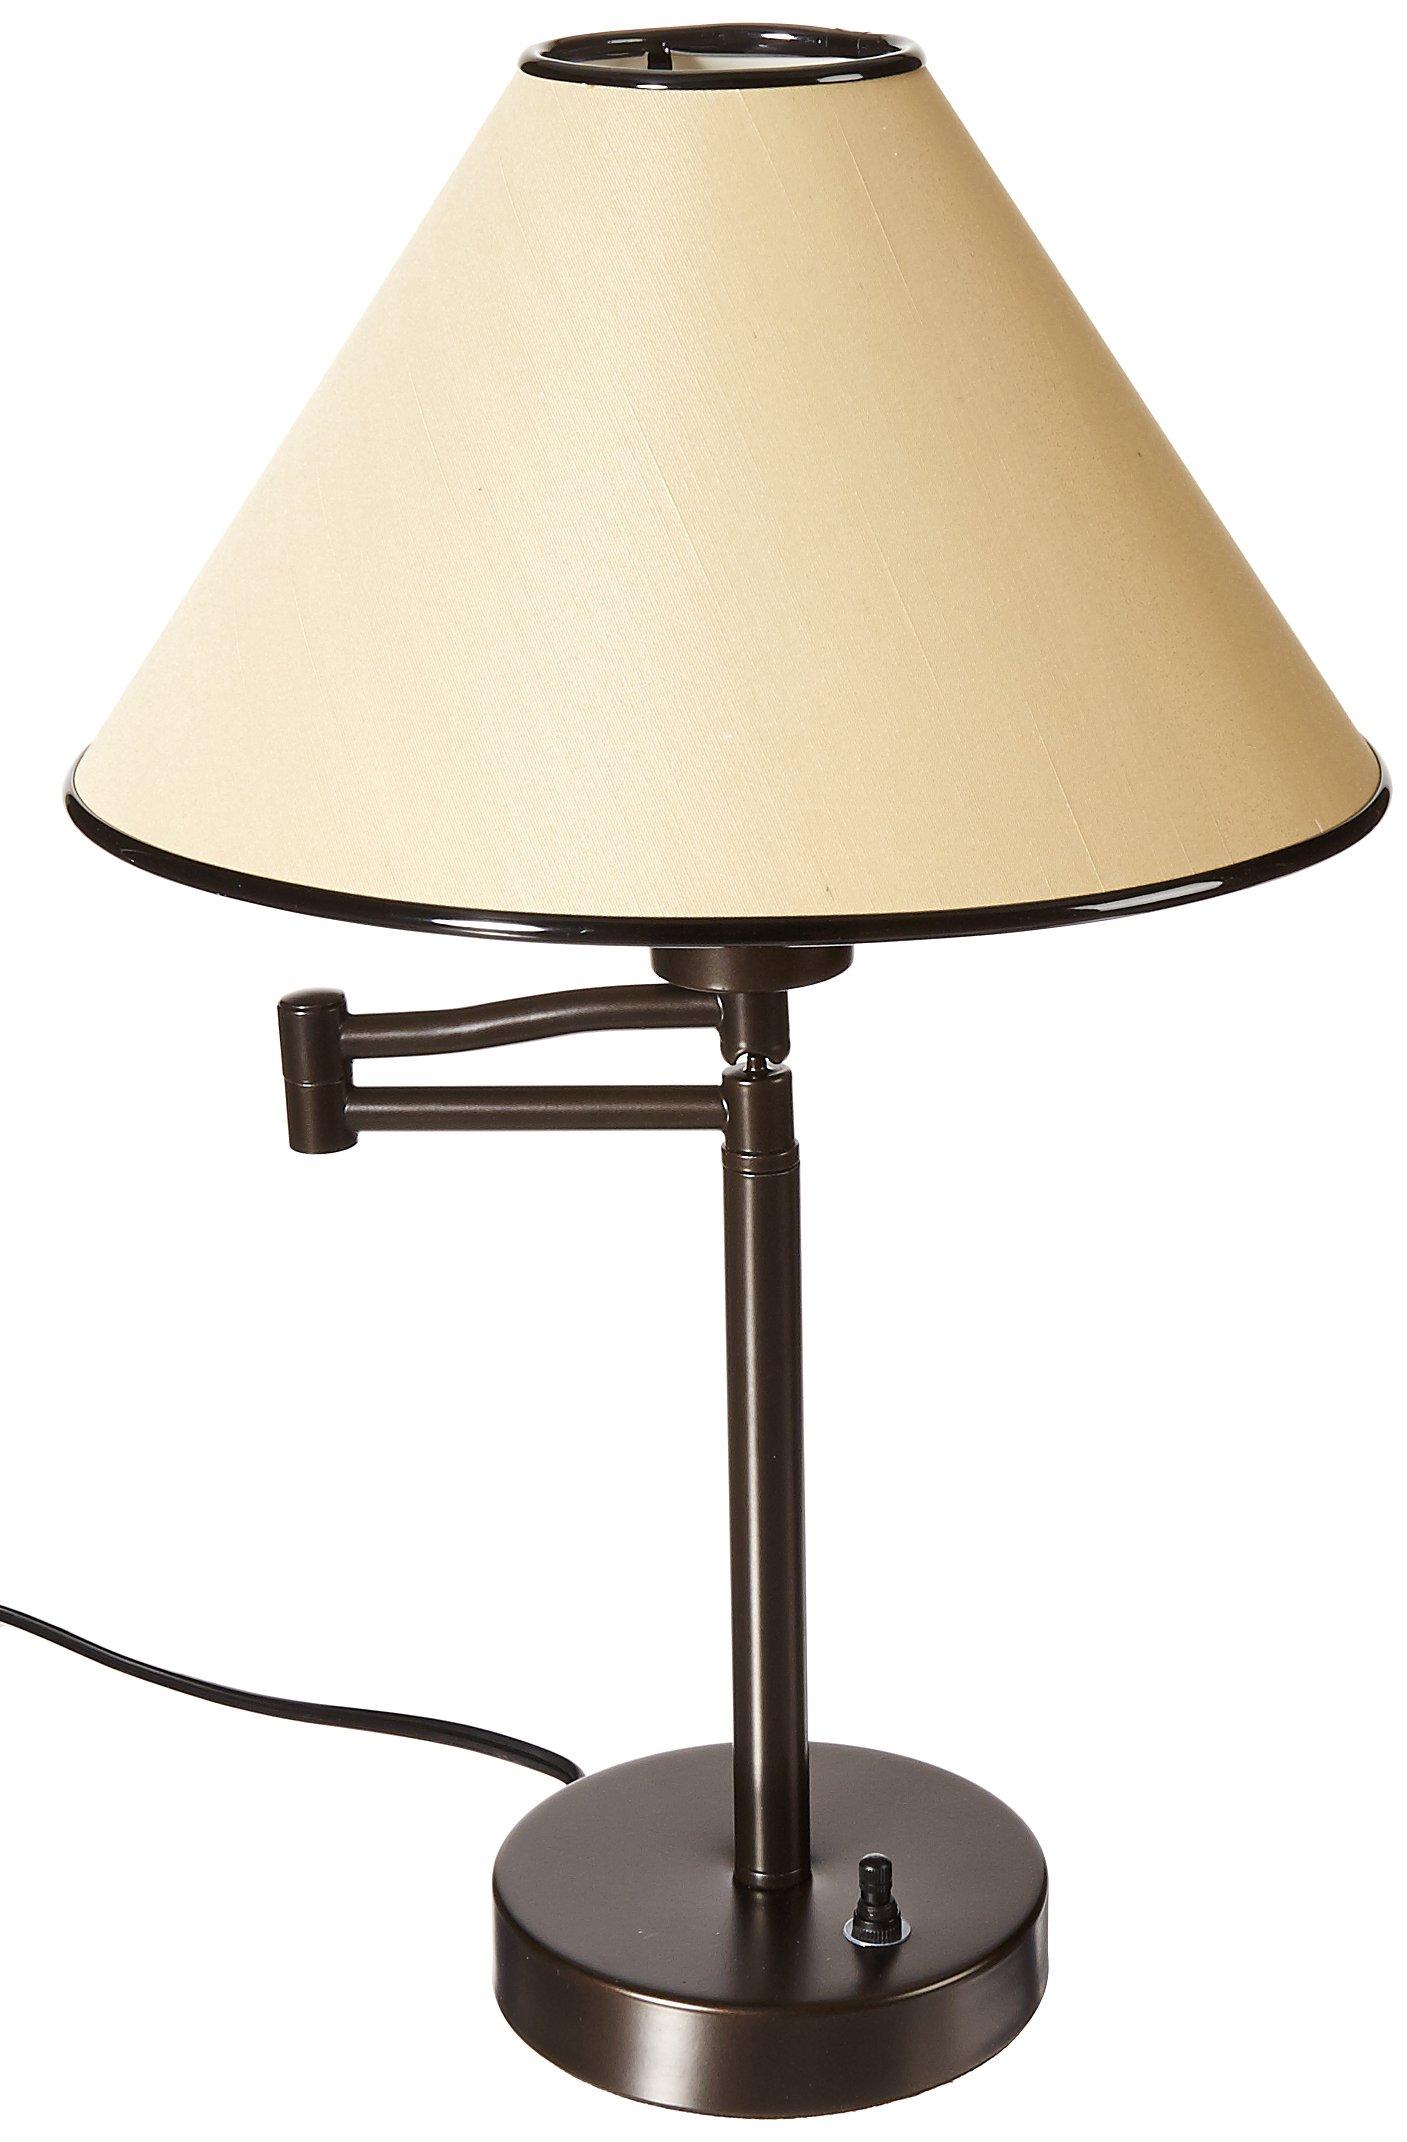 BOSTON HARBOR TB-8008-VB Desk Lamp Swing Arm by Boston Harbor